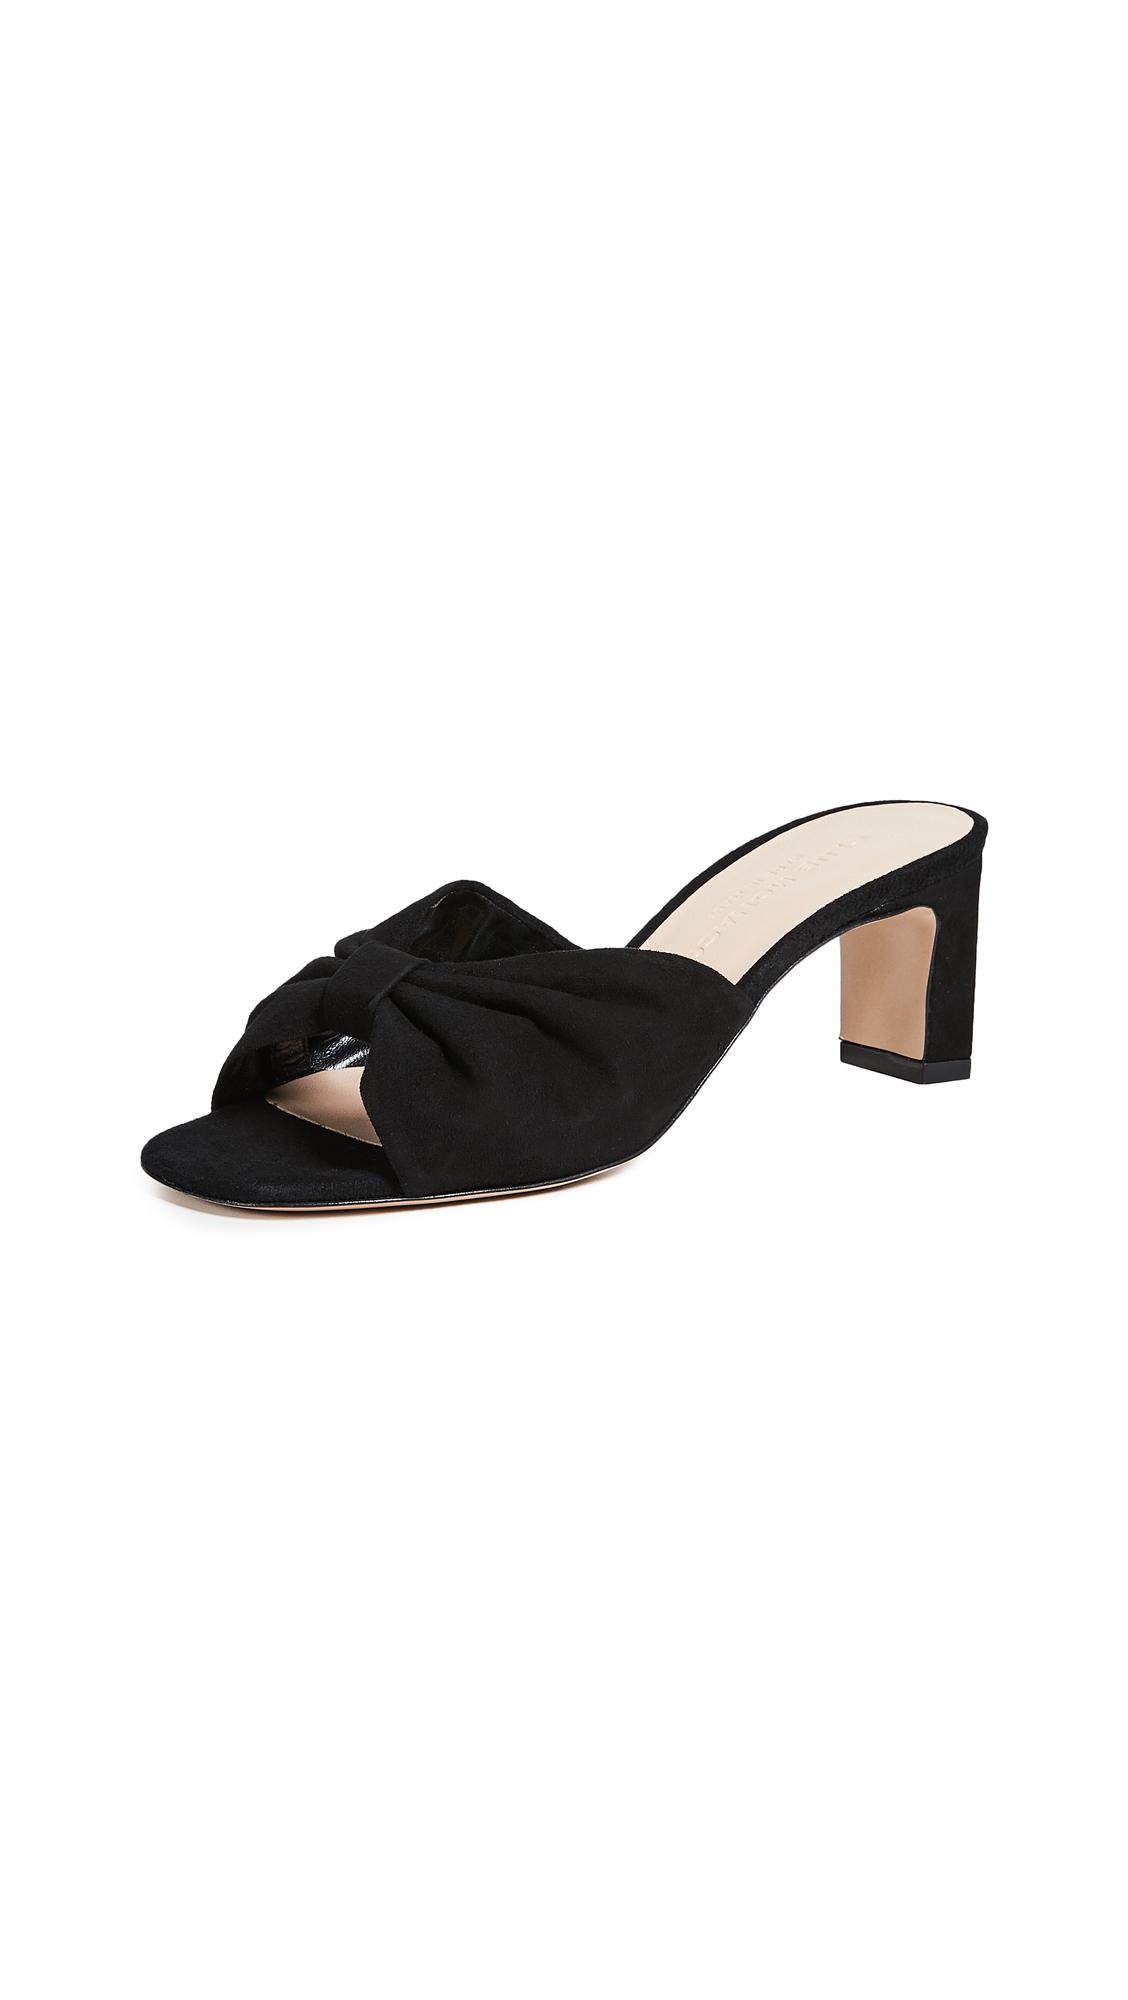 Club Monaco Emmelia Sandals - Black